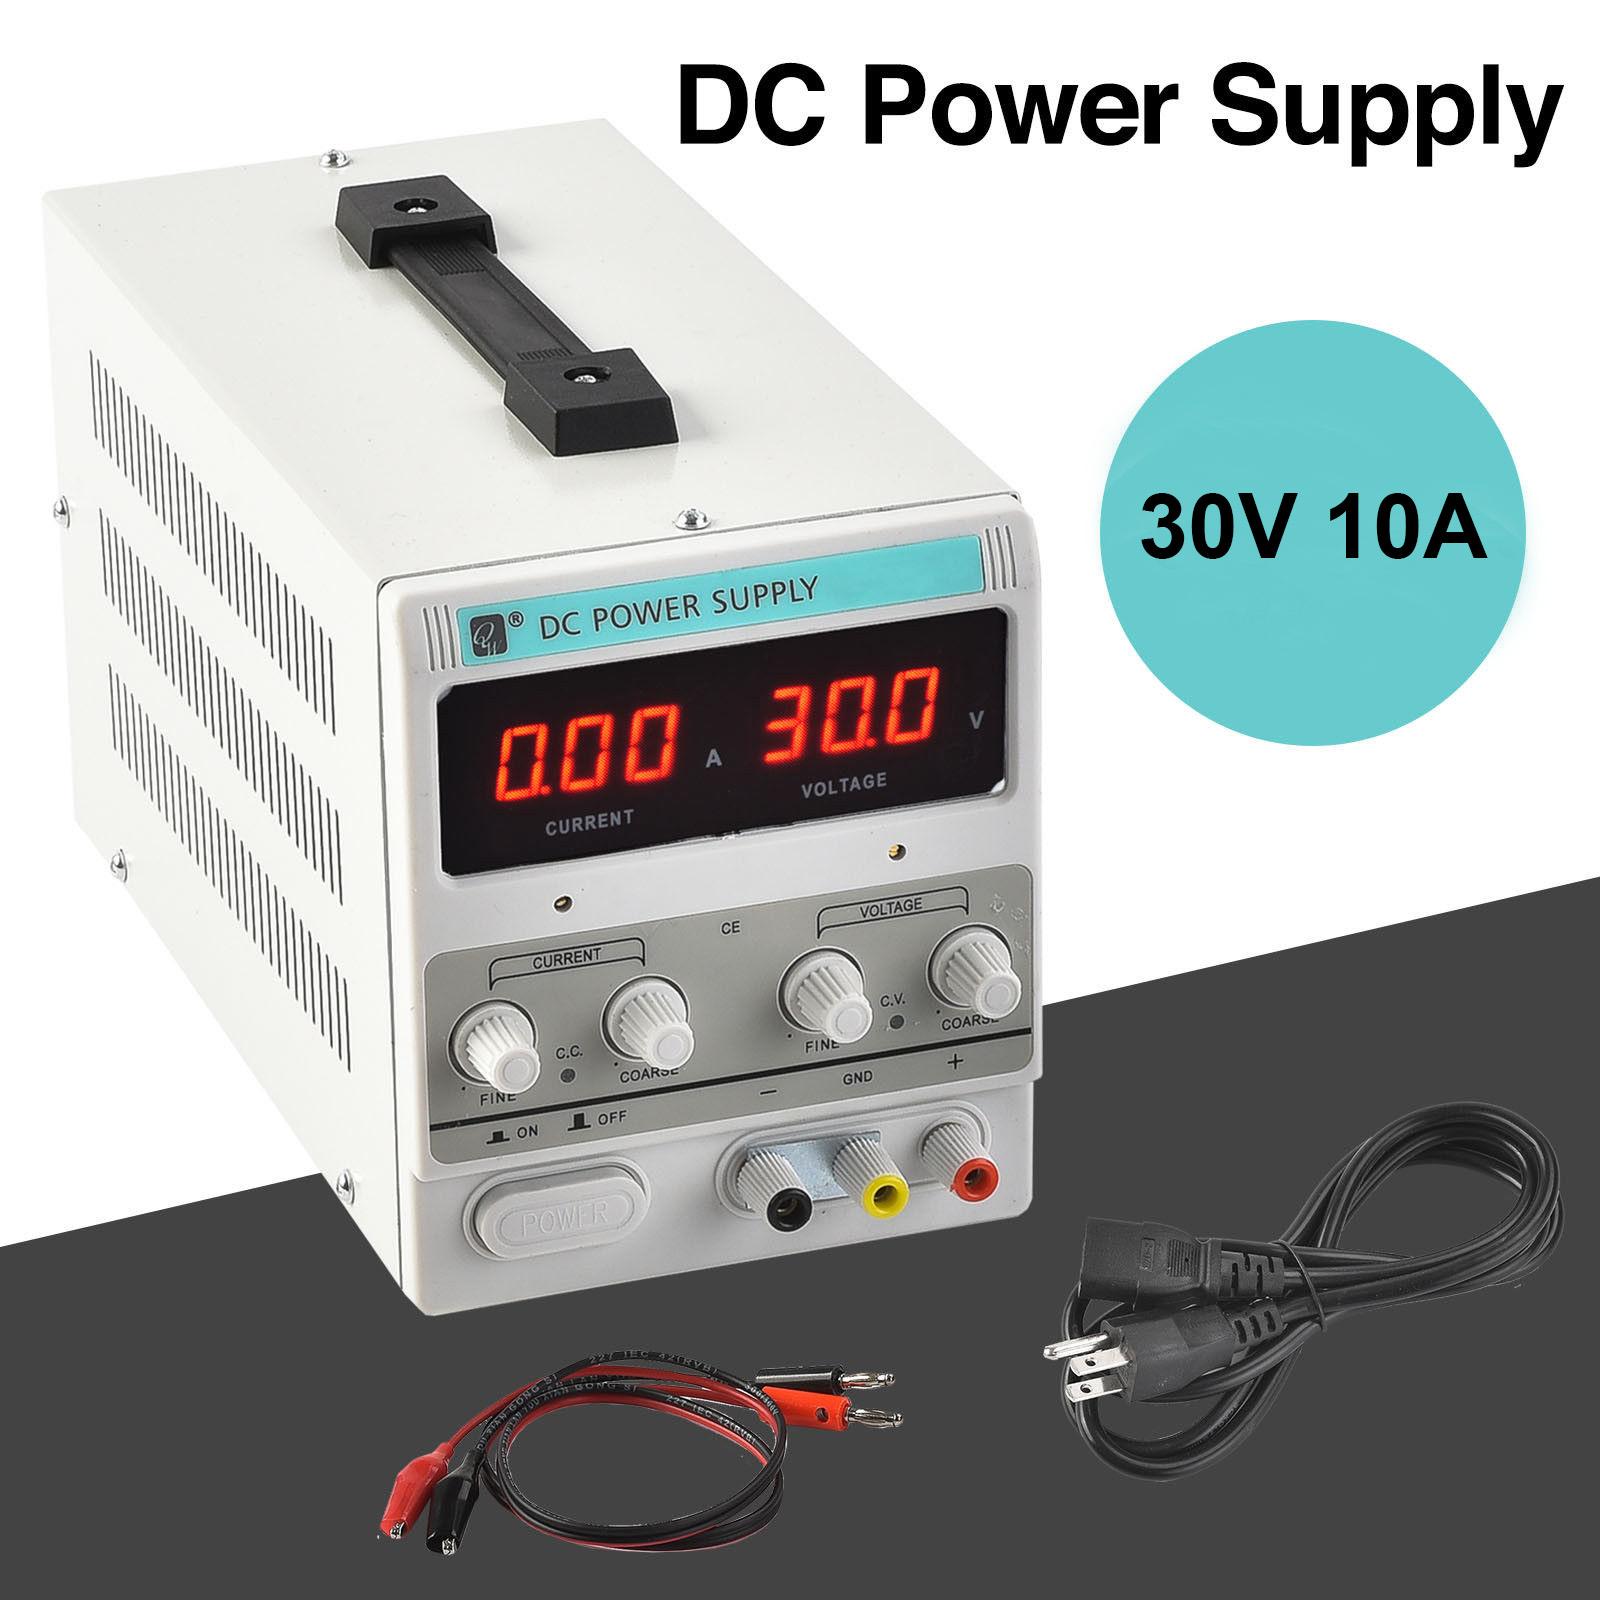 10a 1 30v Variable Power Supply Blaise The Baker Adjustable Dc Voltage Regulator Module Lm317 Mpjacom Digital Regulated Lab Grade W Cable